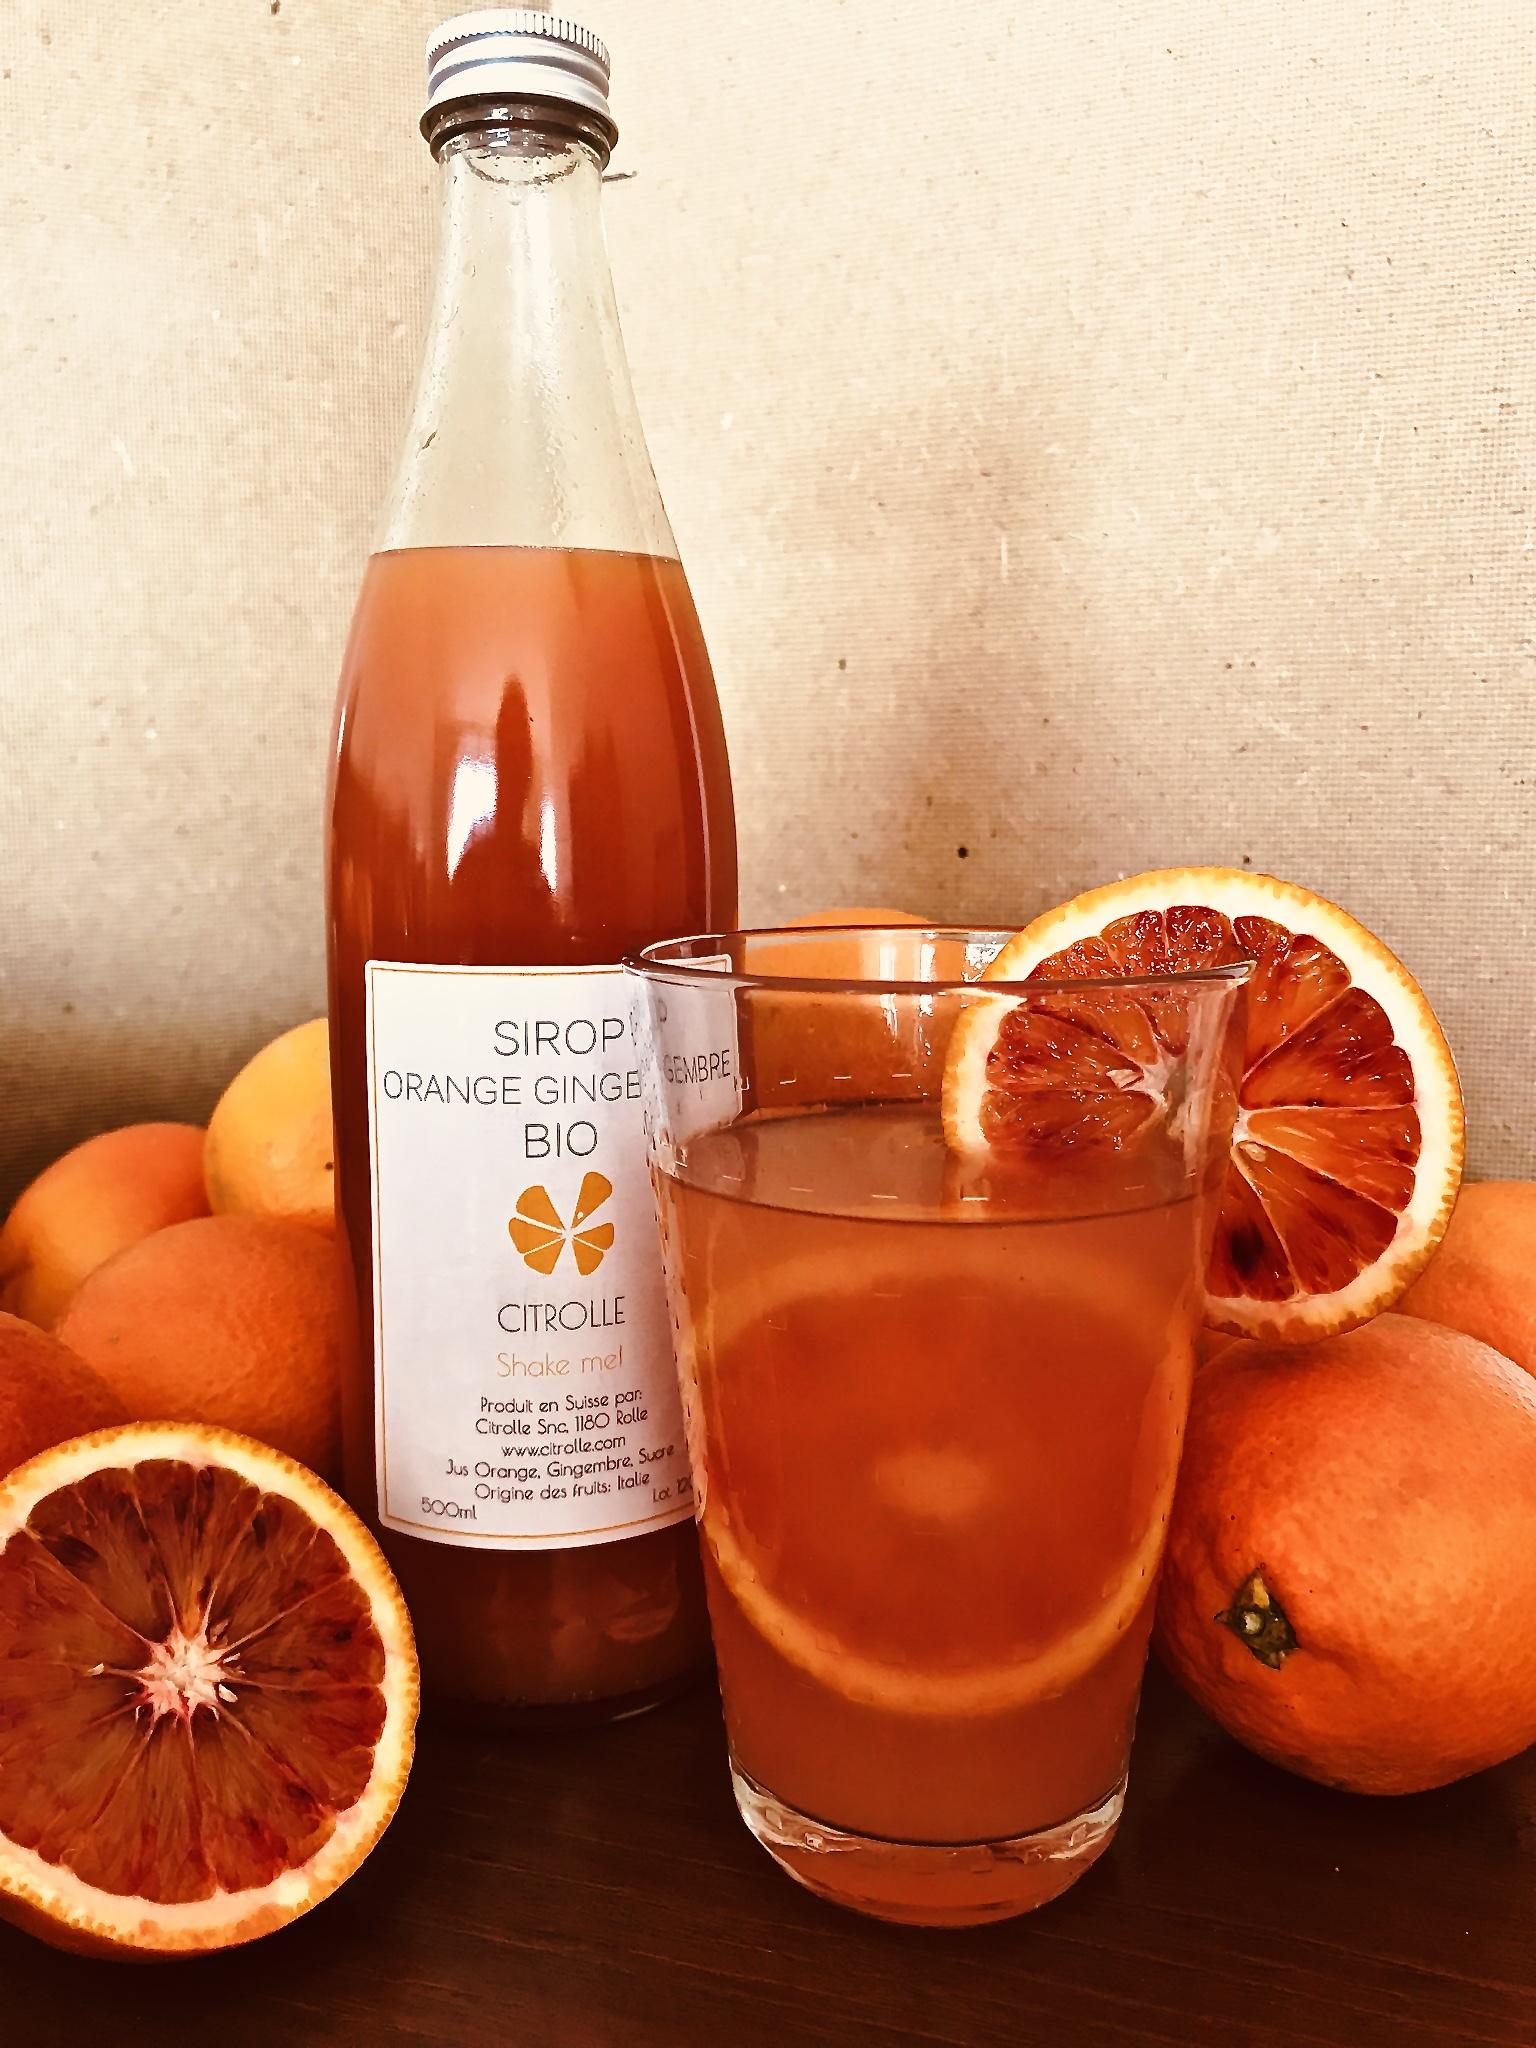 Sirop Orange Gingembre BIO